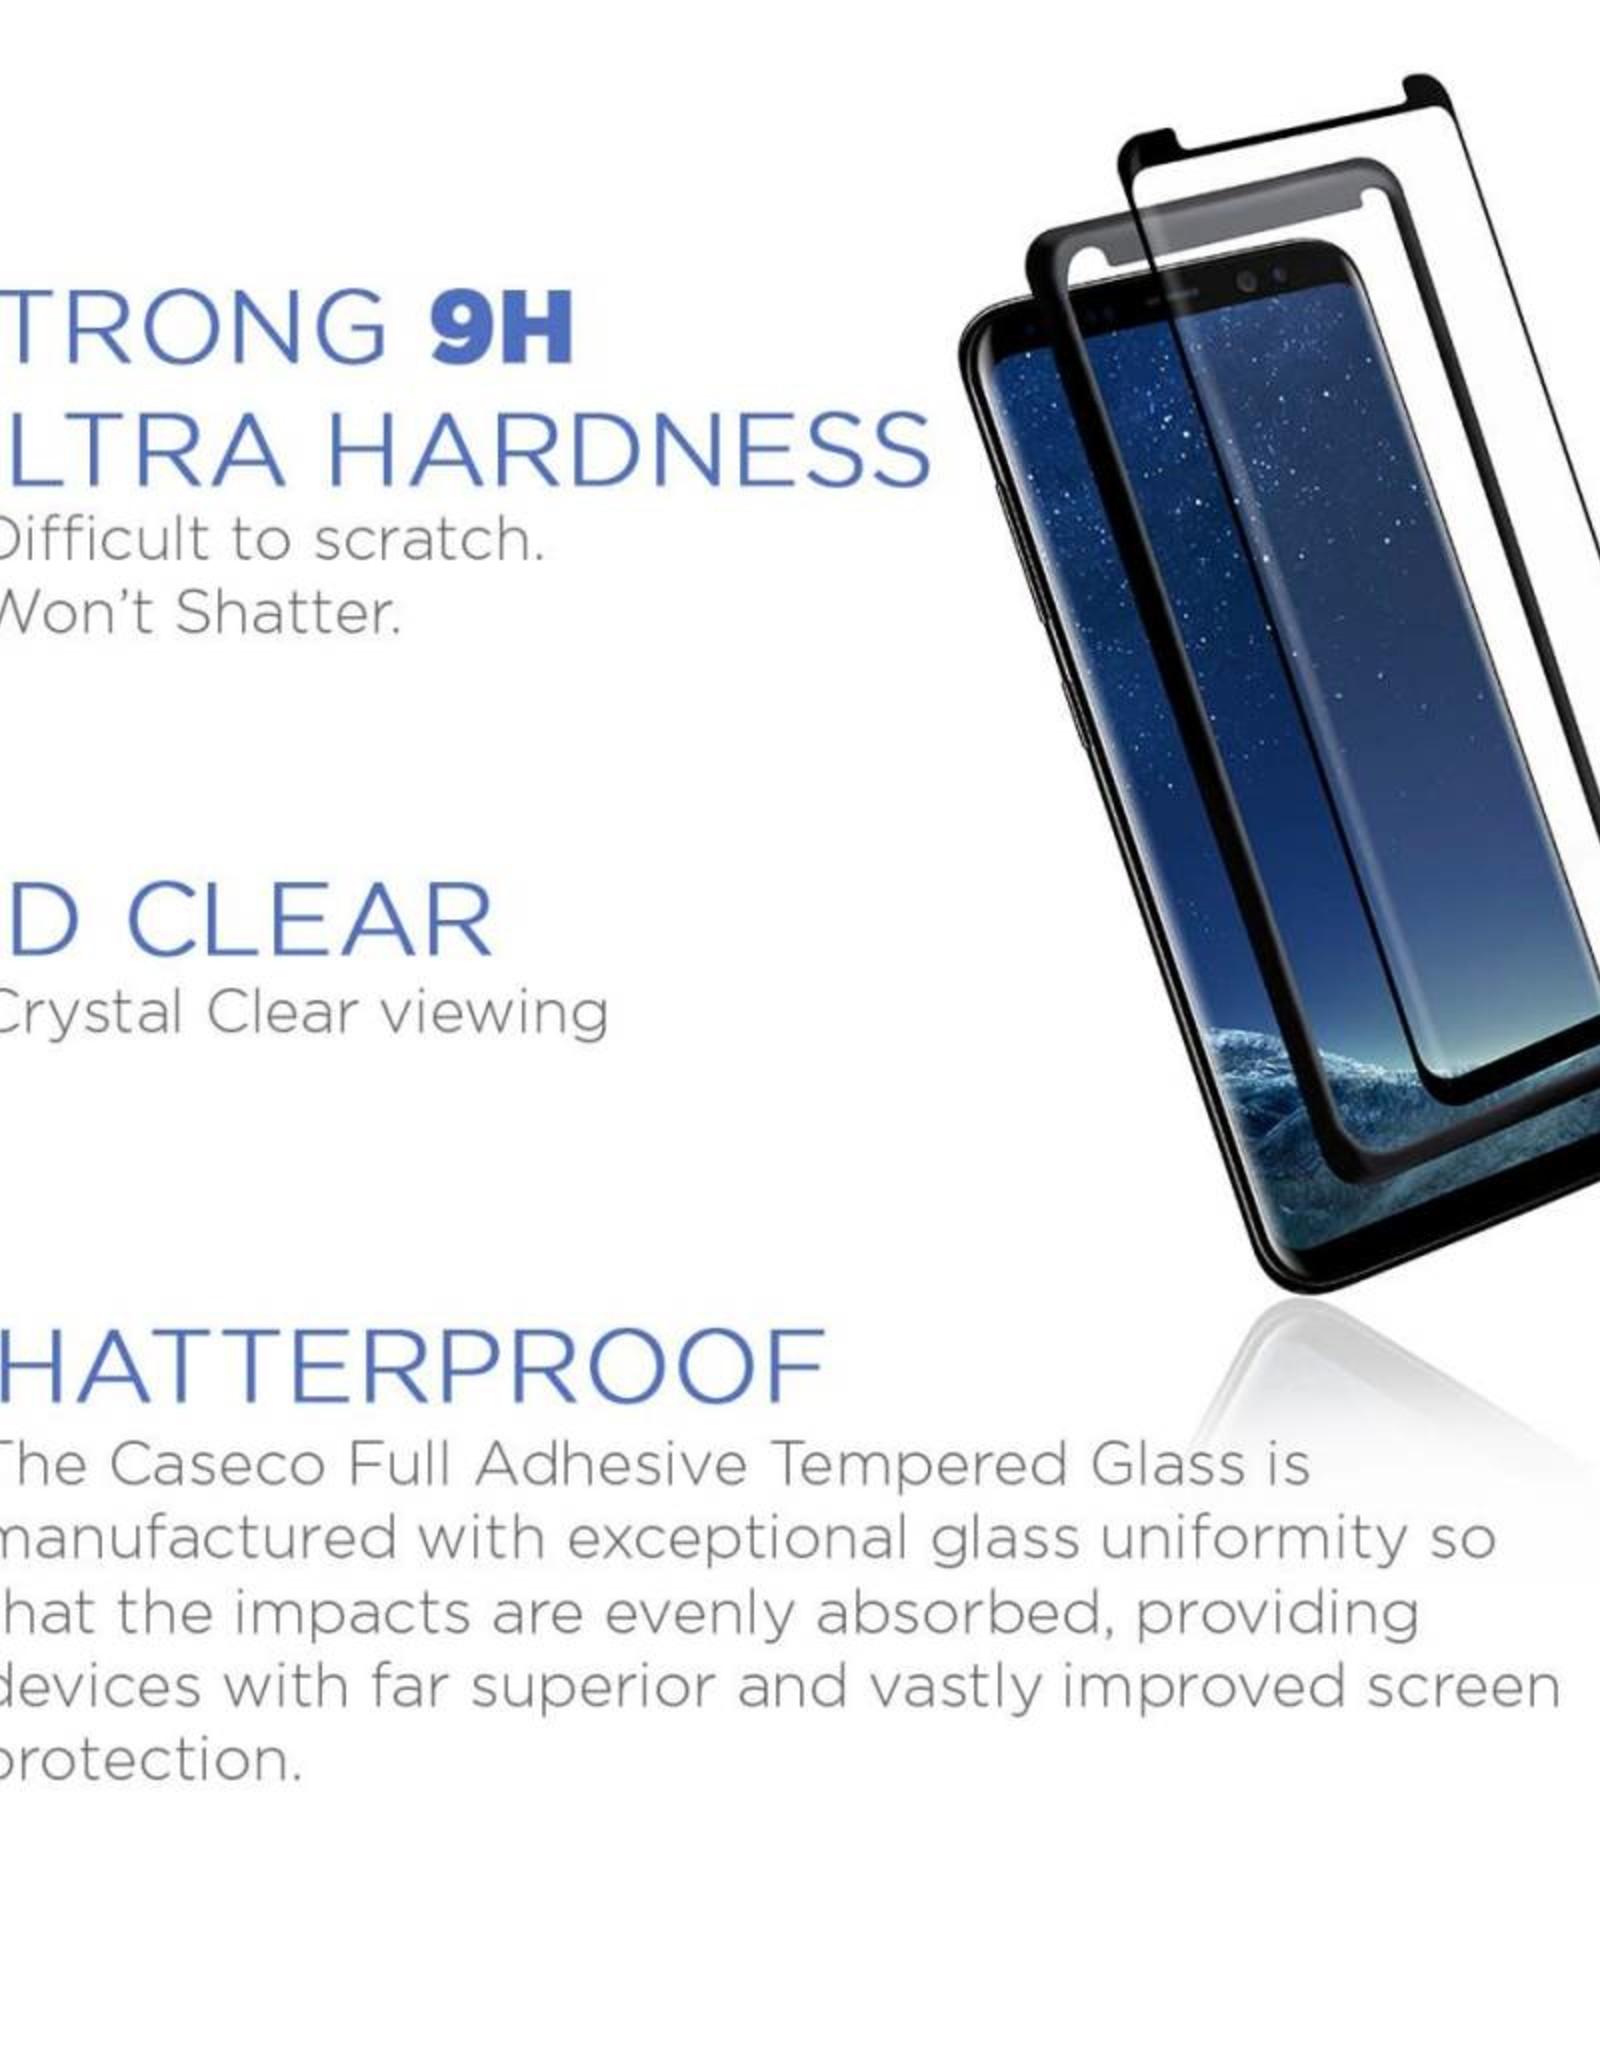 Caseco Caseco | Samsung Galaxy S8+ Premium Full Adhesive Tempered Glass Screen Protector | WXCC-SP-FA-GS8P